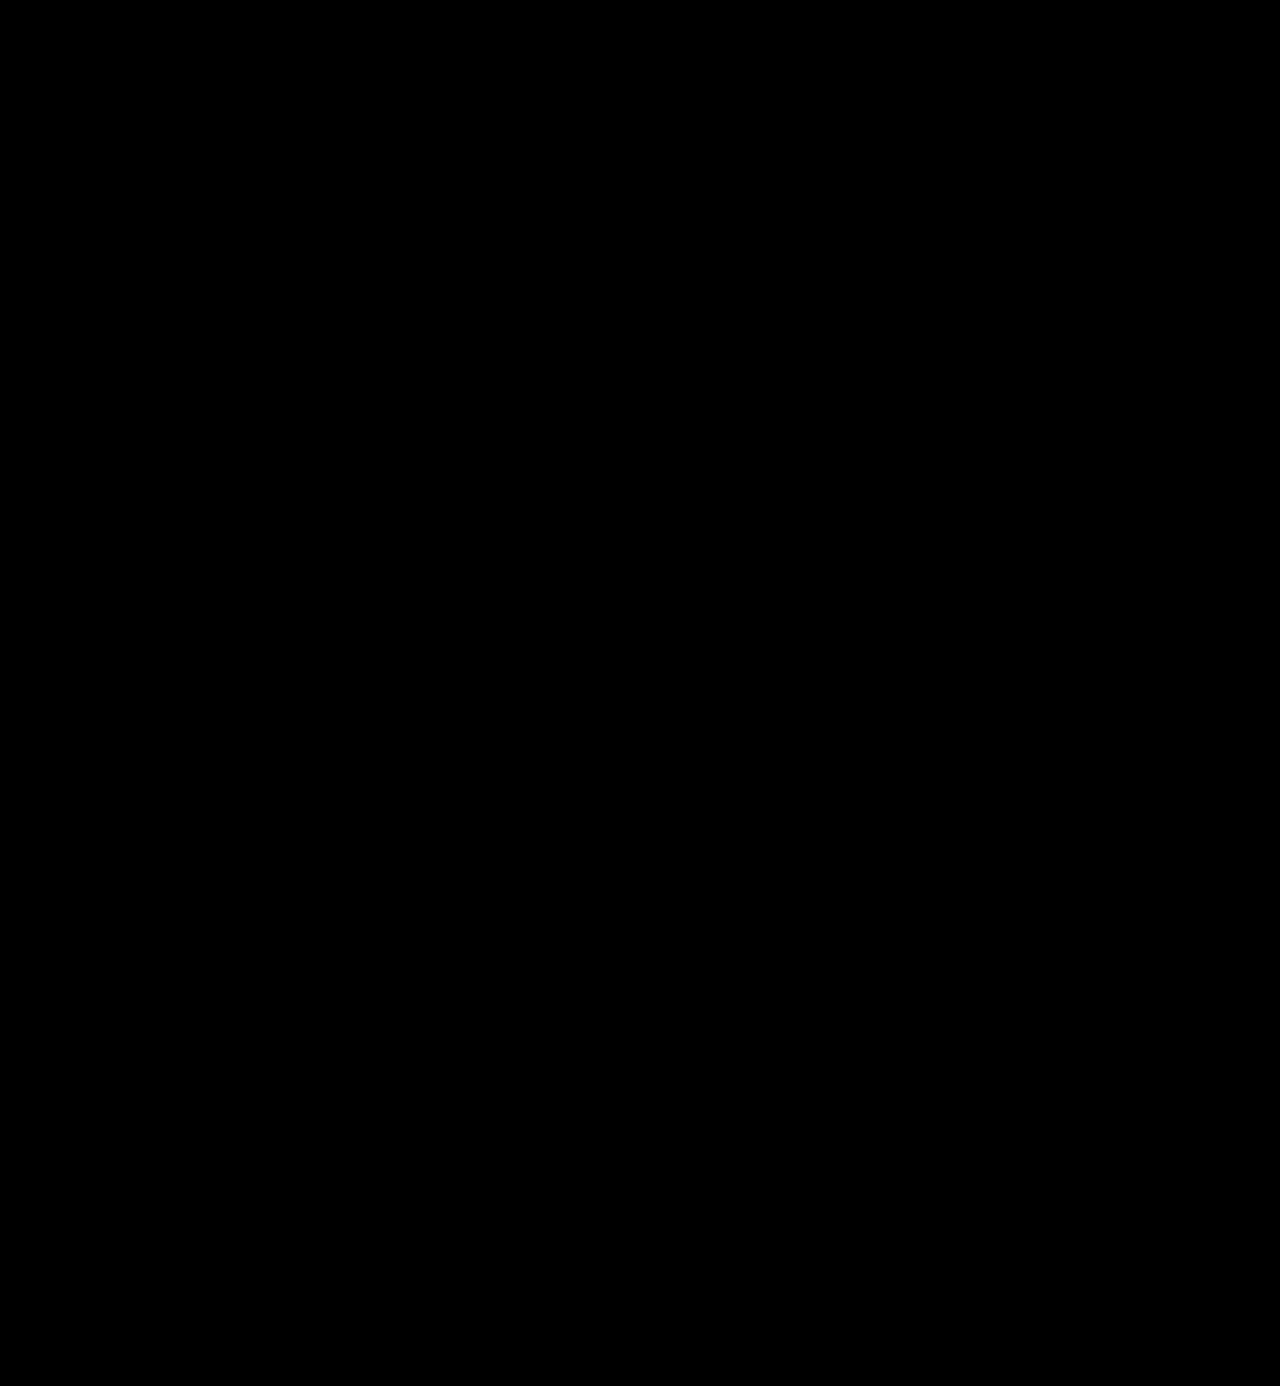 Sasuke Boruto The Movie Lineart By Rosolinio On Deviantart